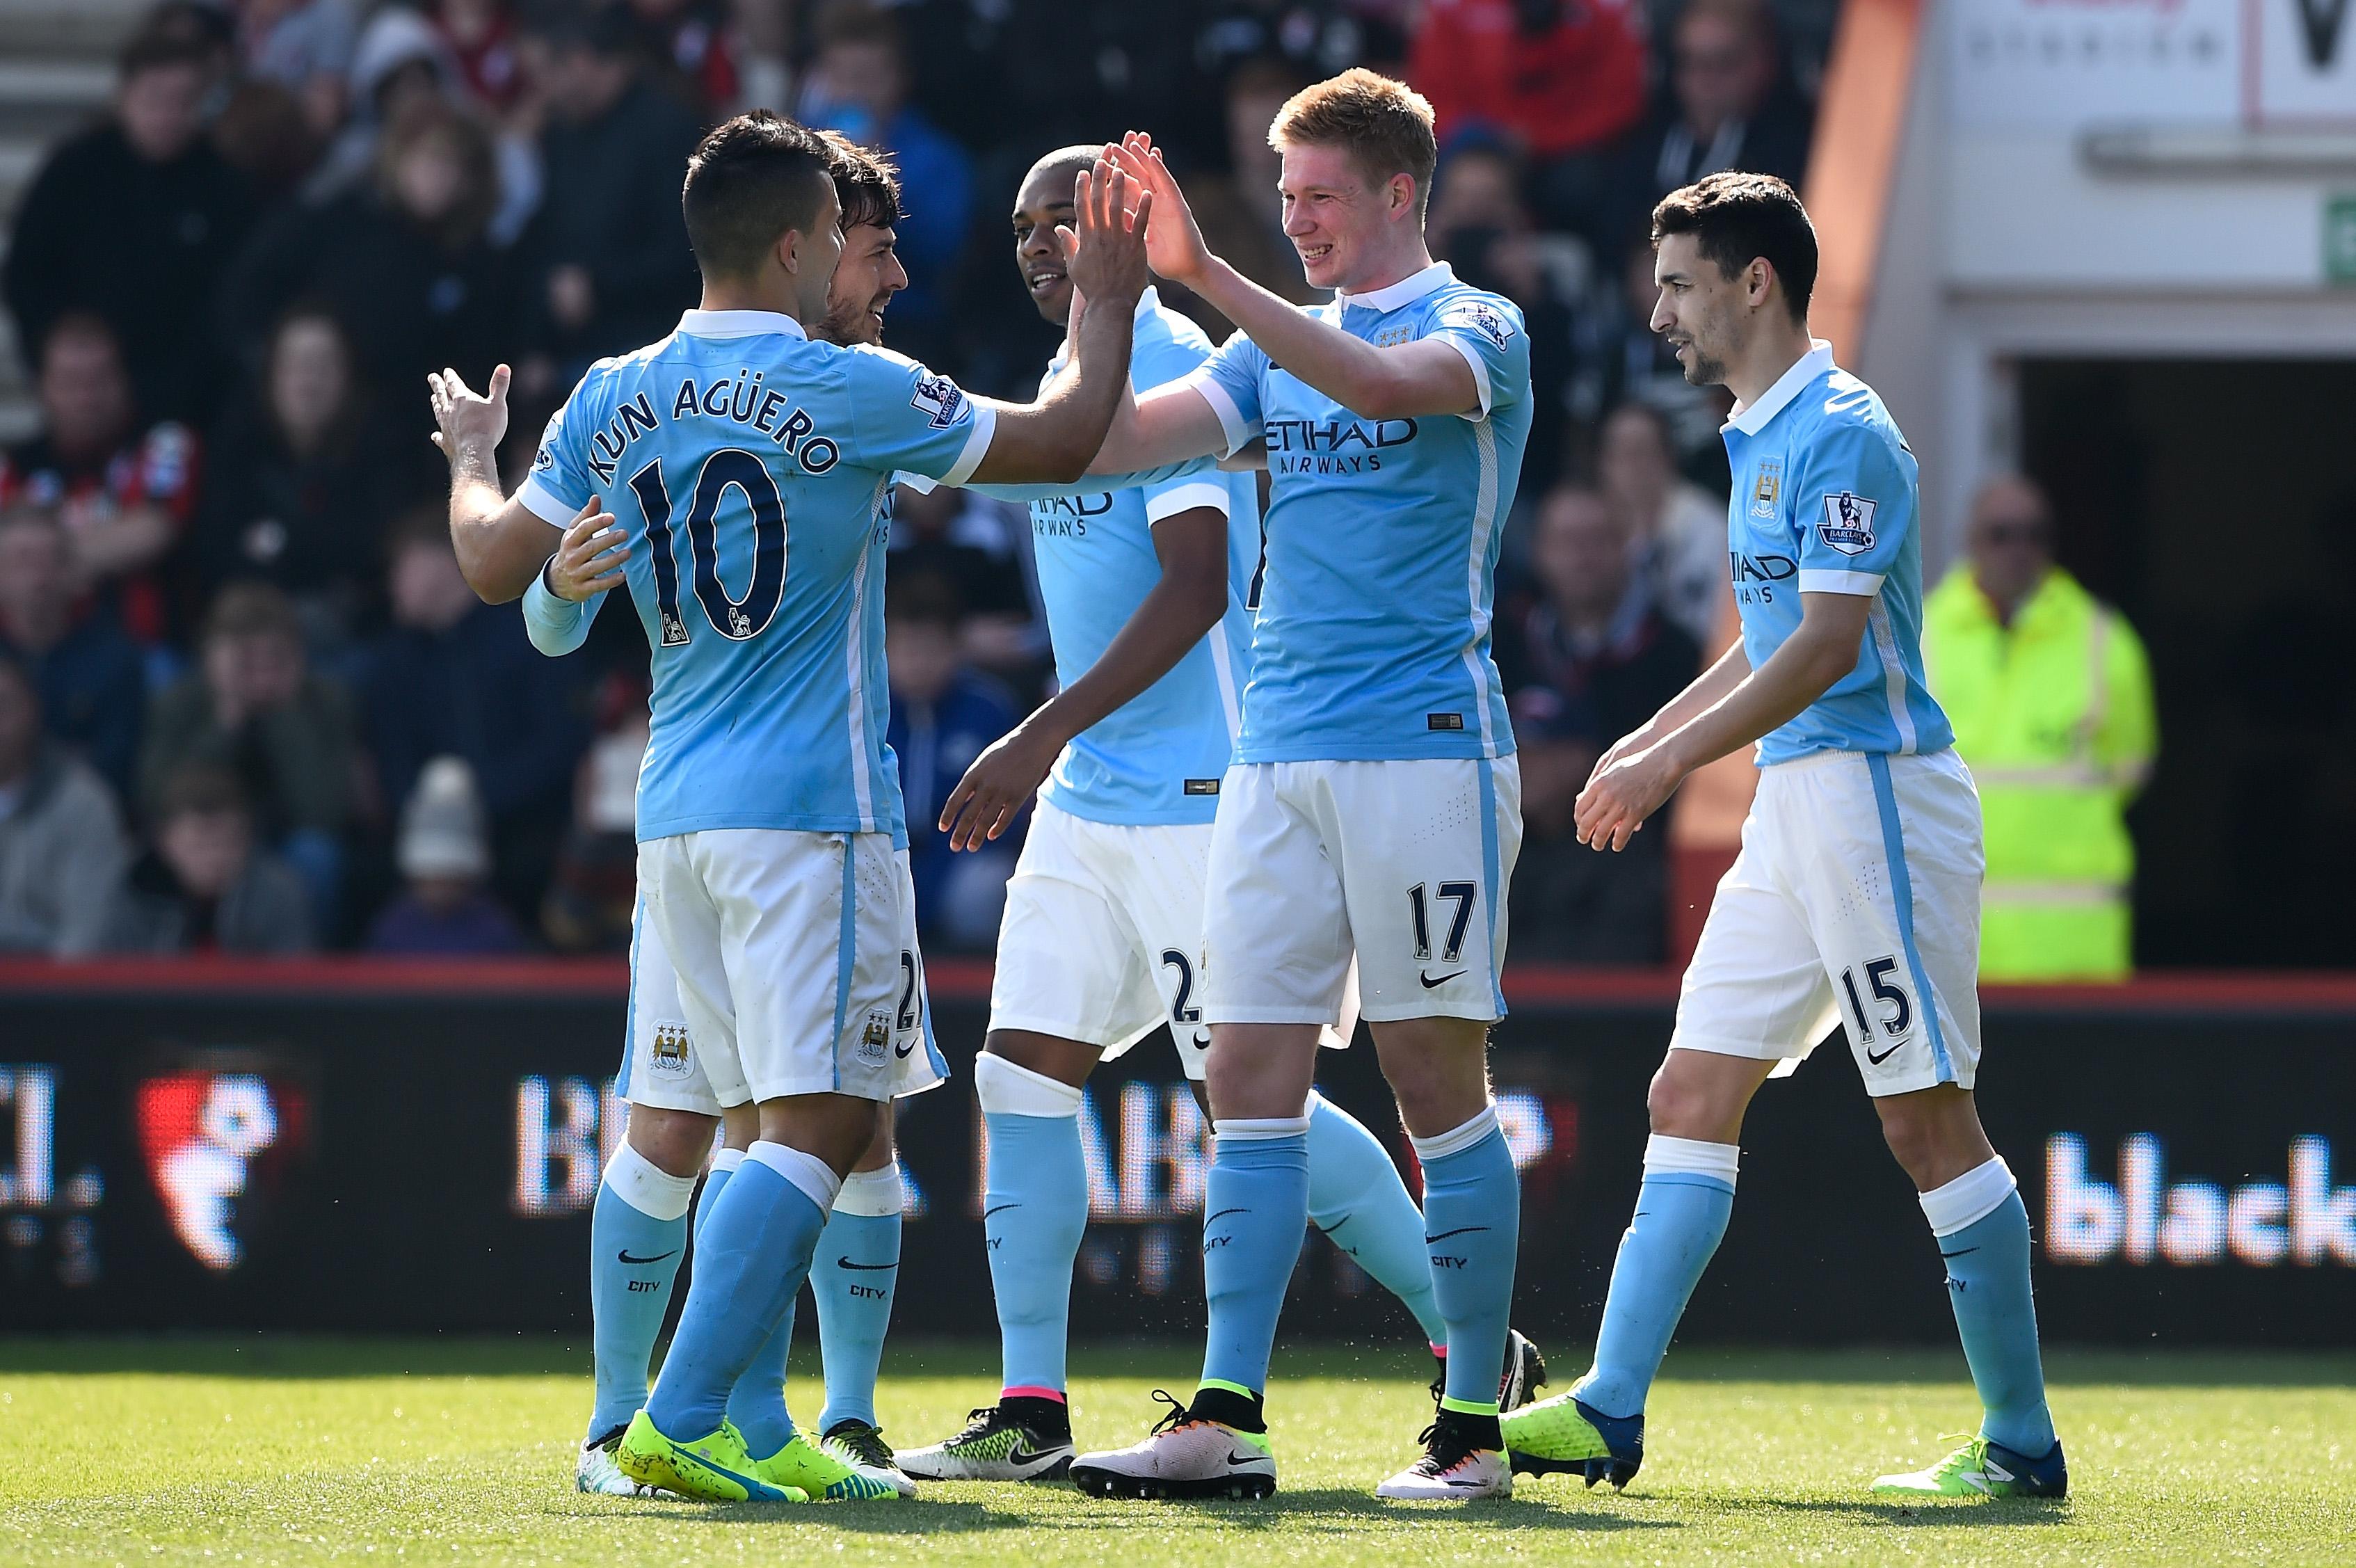 Manchester City: De Bruyne not certain for PSG game